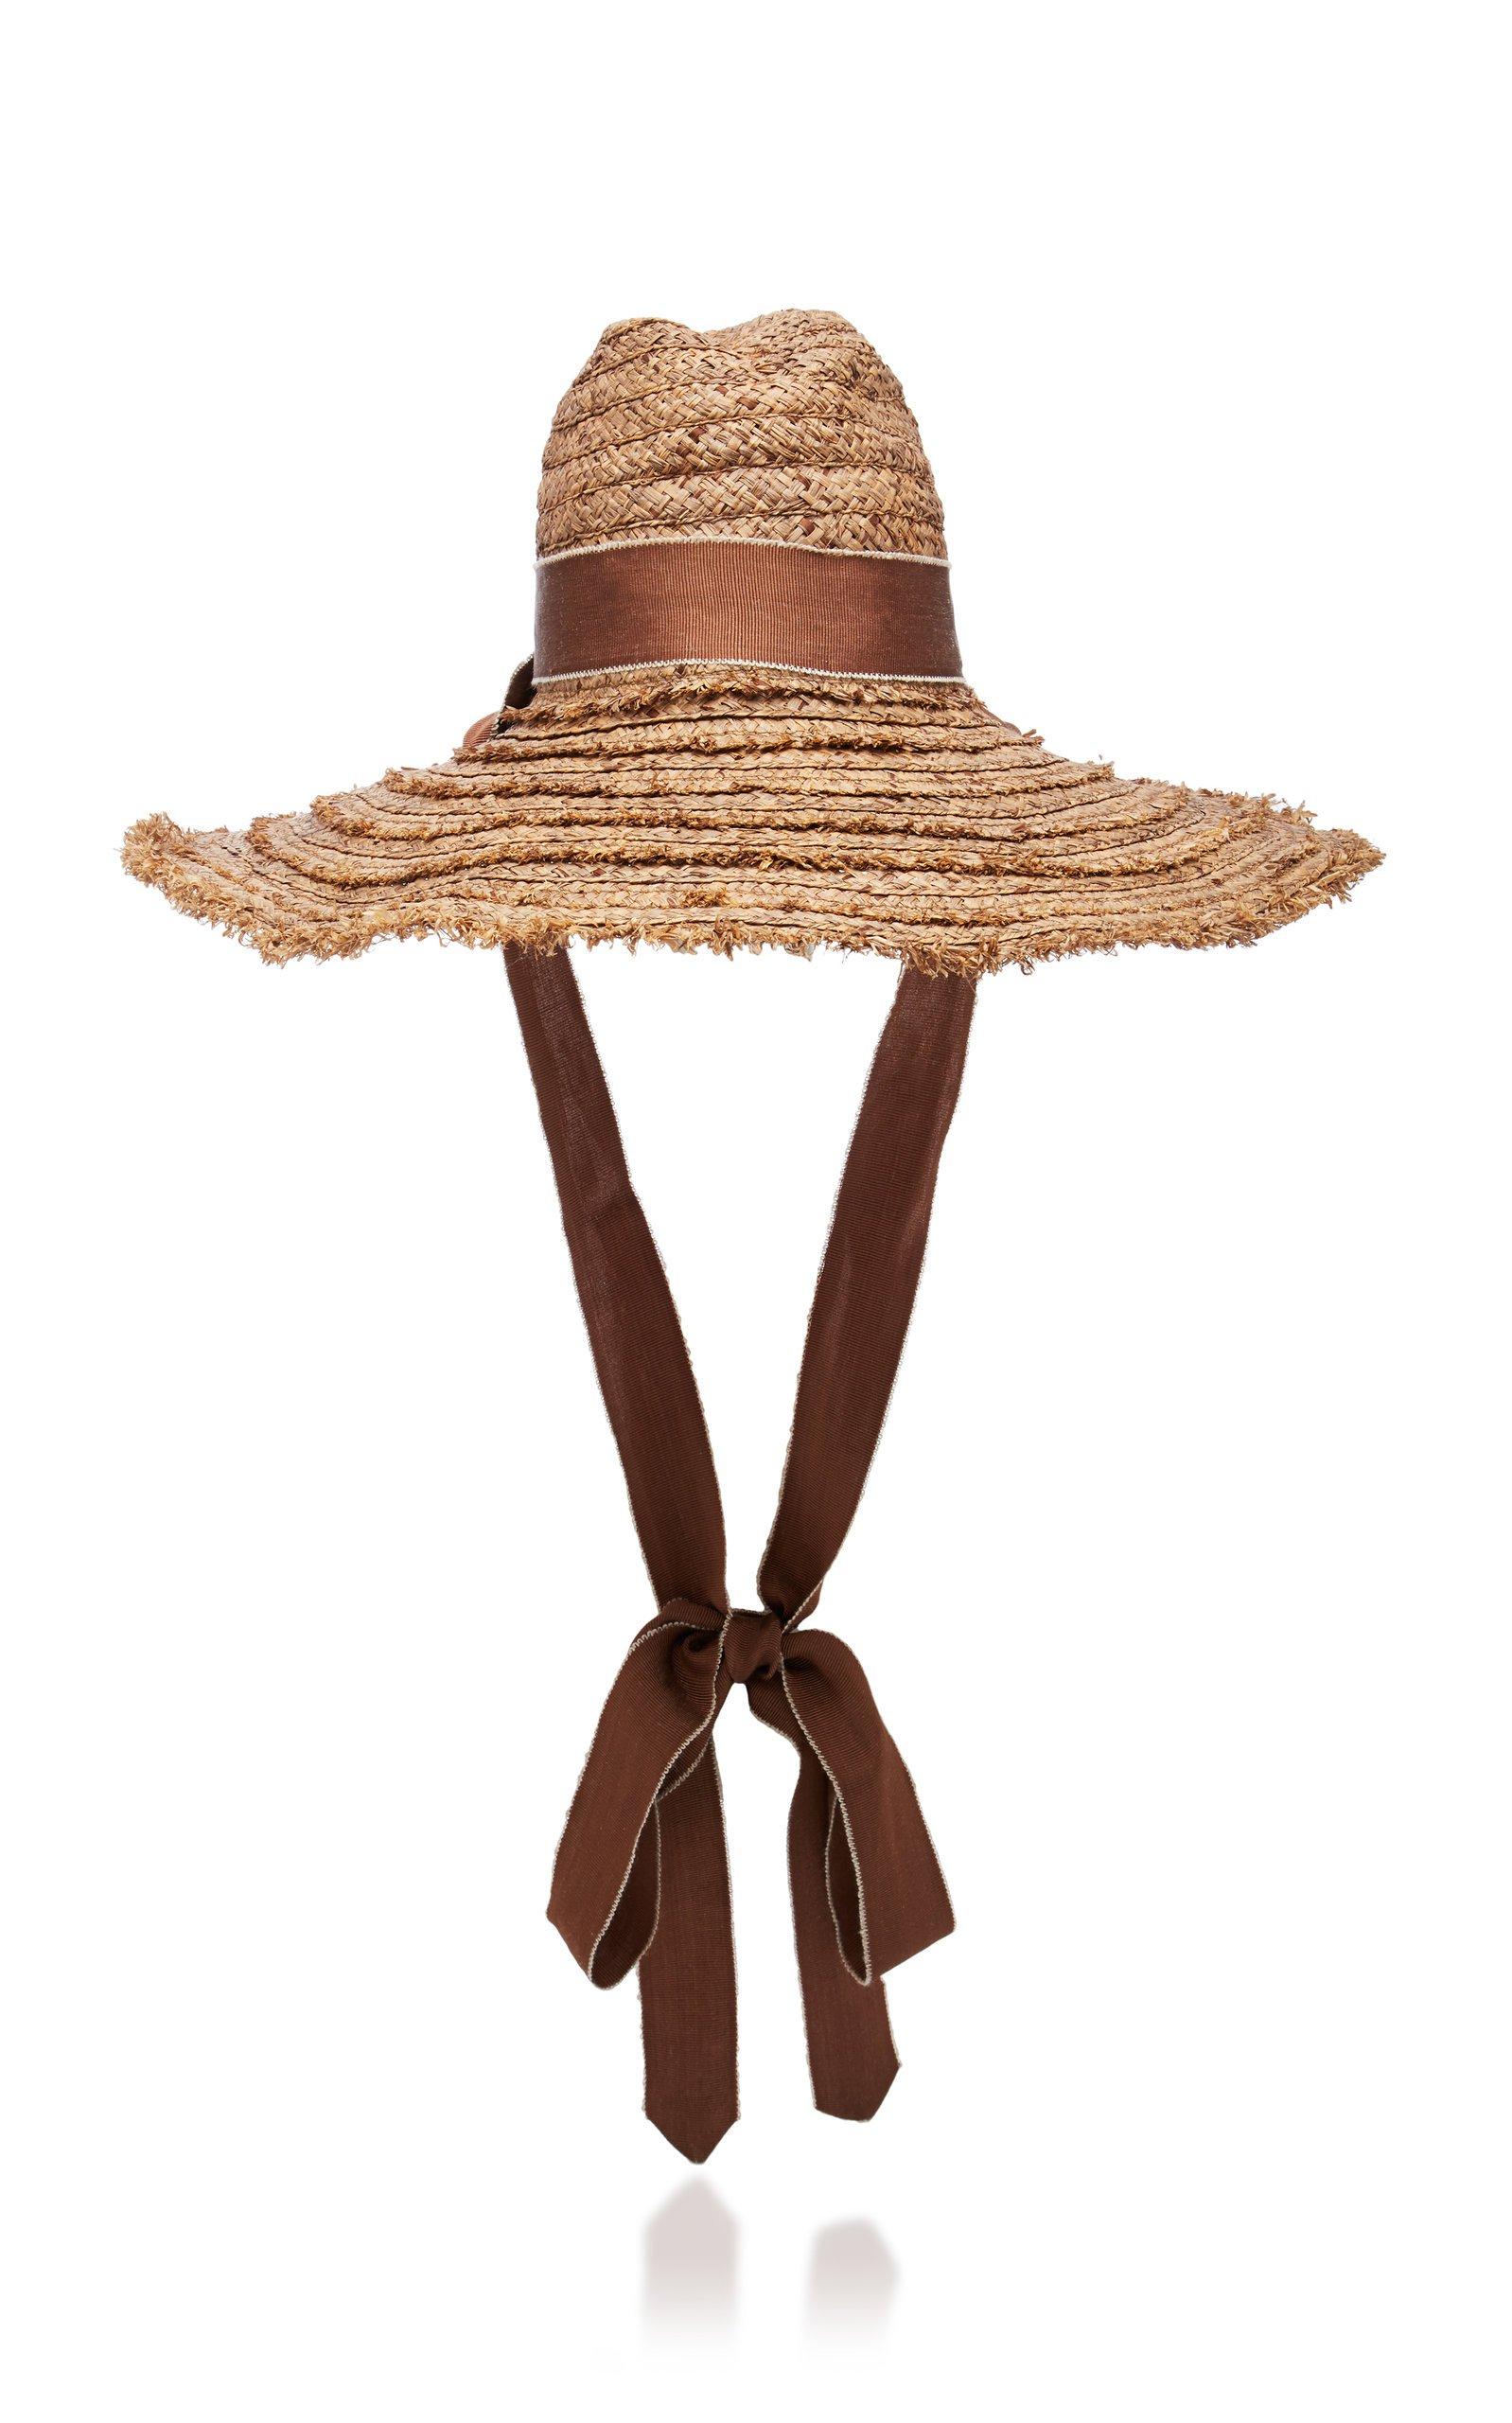 Mauritius Grosgrain-Trimmed Straw Hat by Filu Hats | Moda Operandi